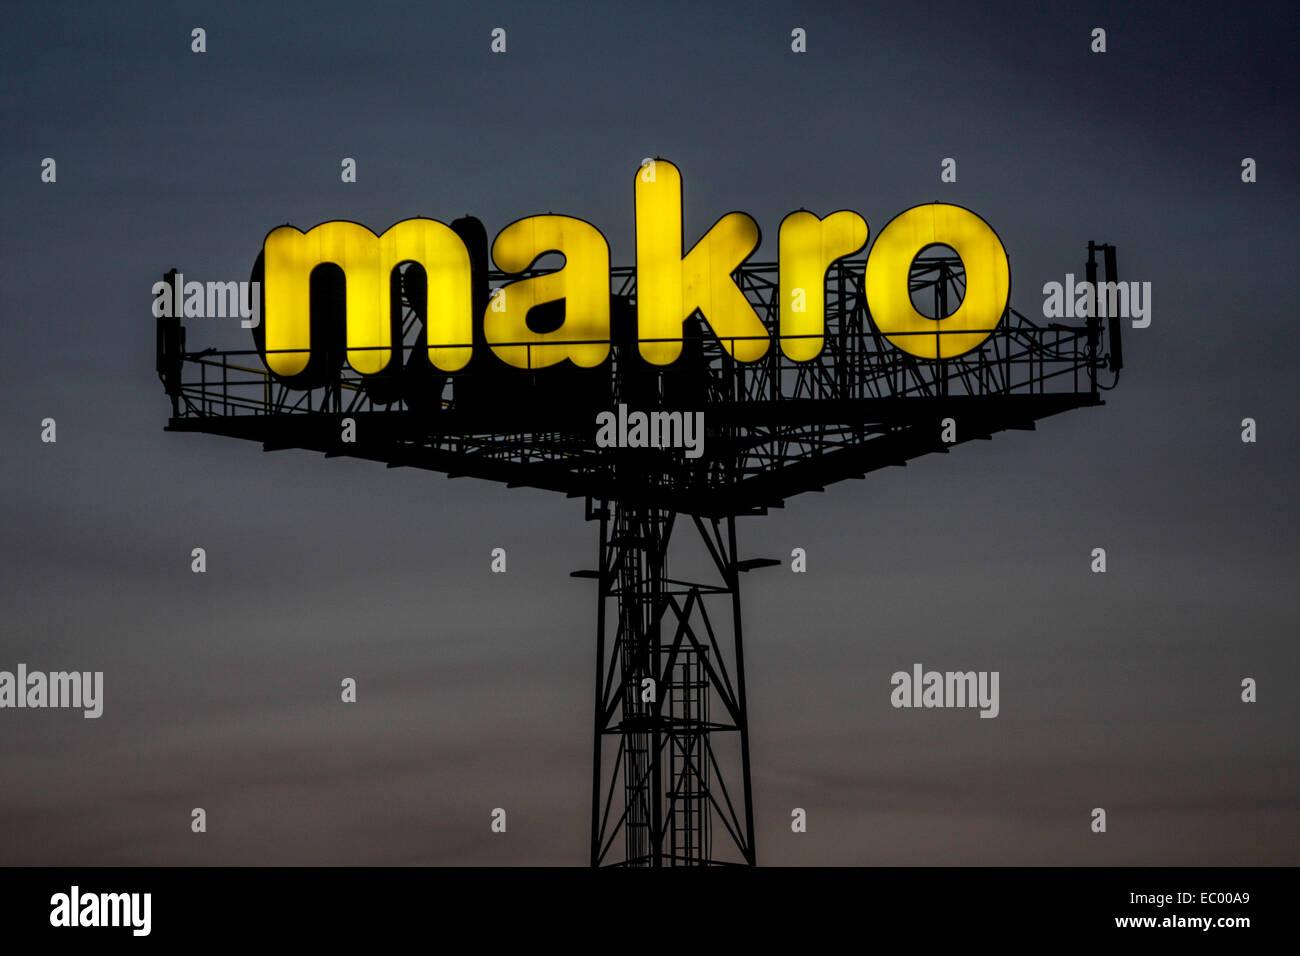 Makro logo sign ad Prague Czech Republic - Stock Image